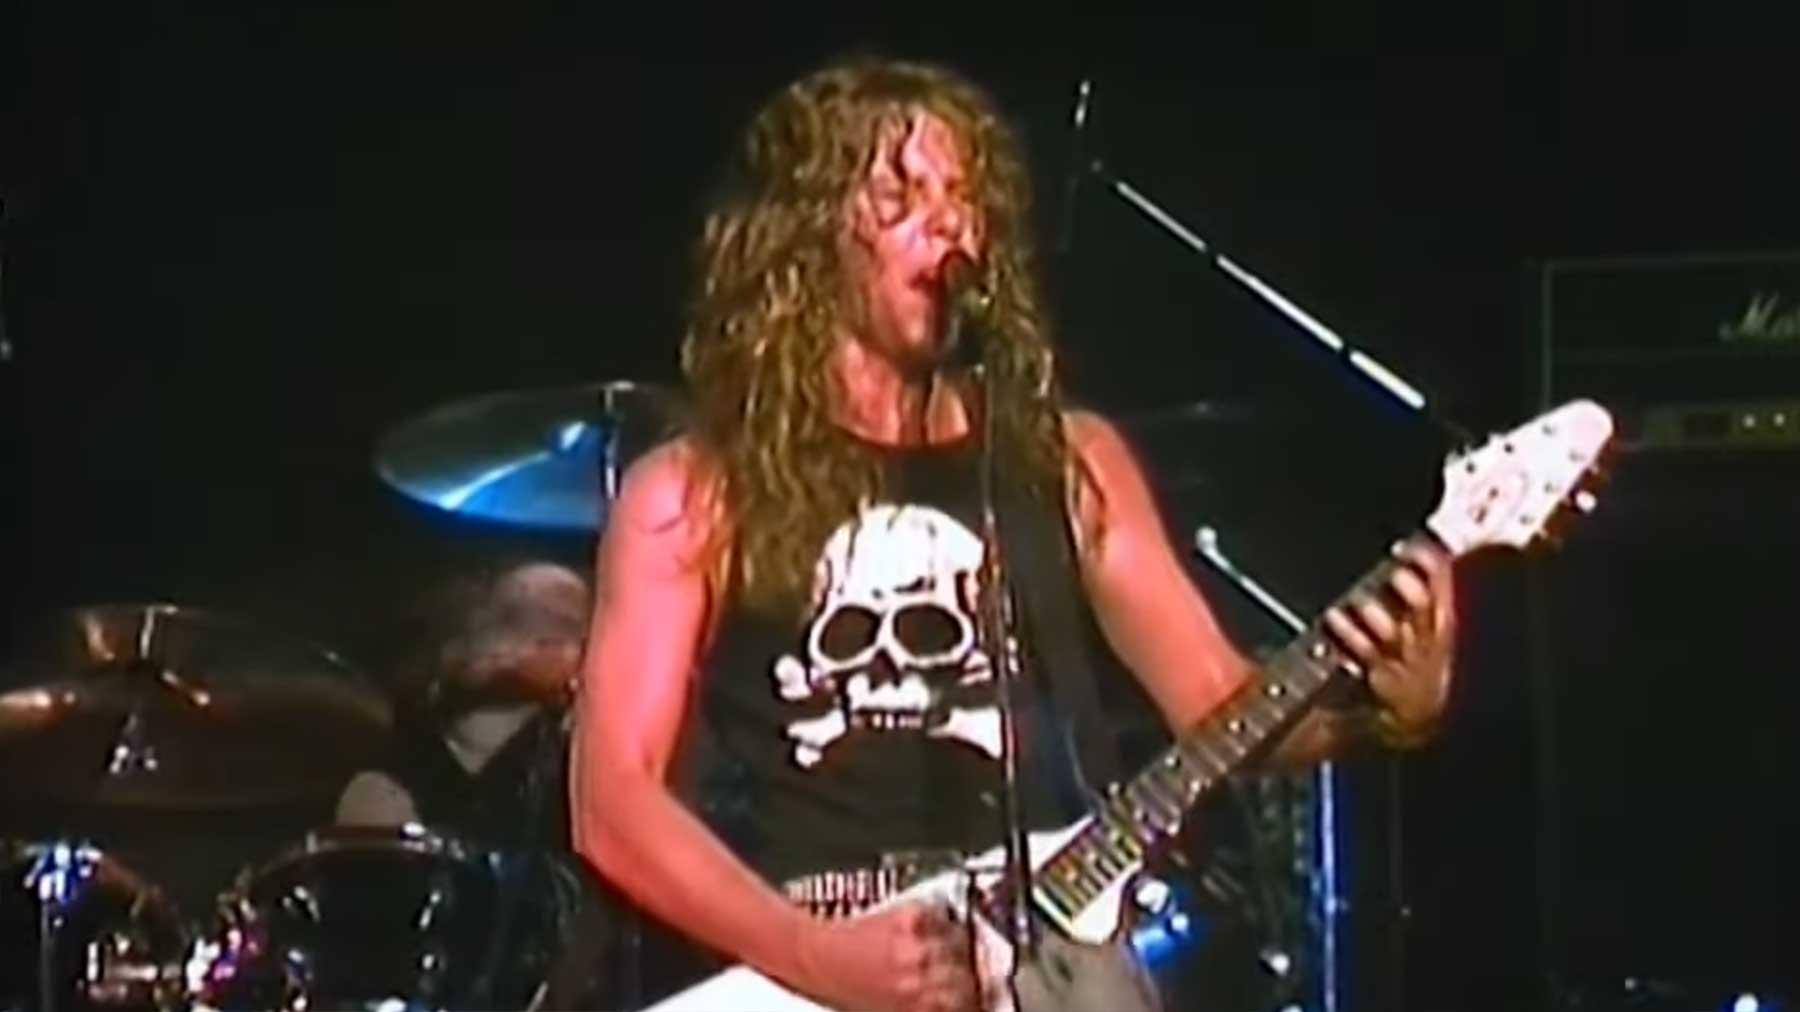 Metallica-Konzert aus dem Jahr 1983 metallica-konzert-1983